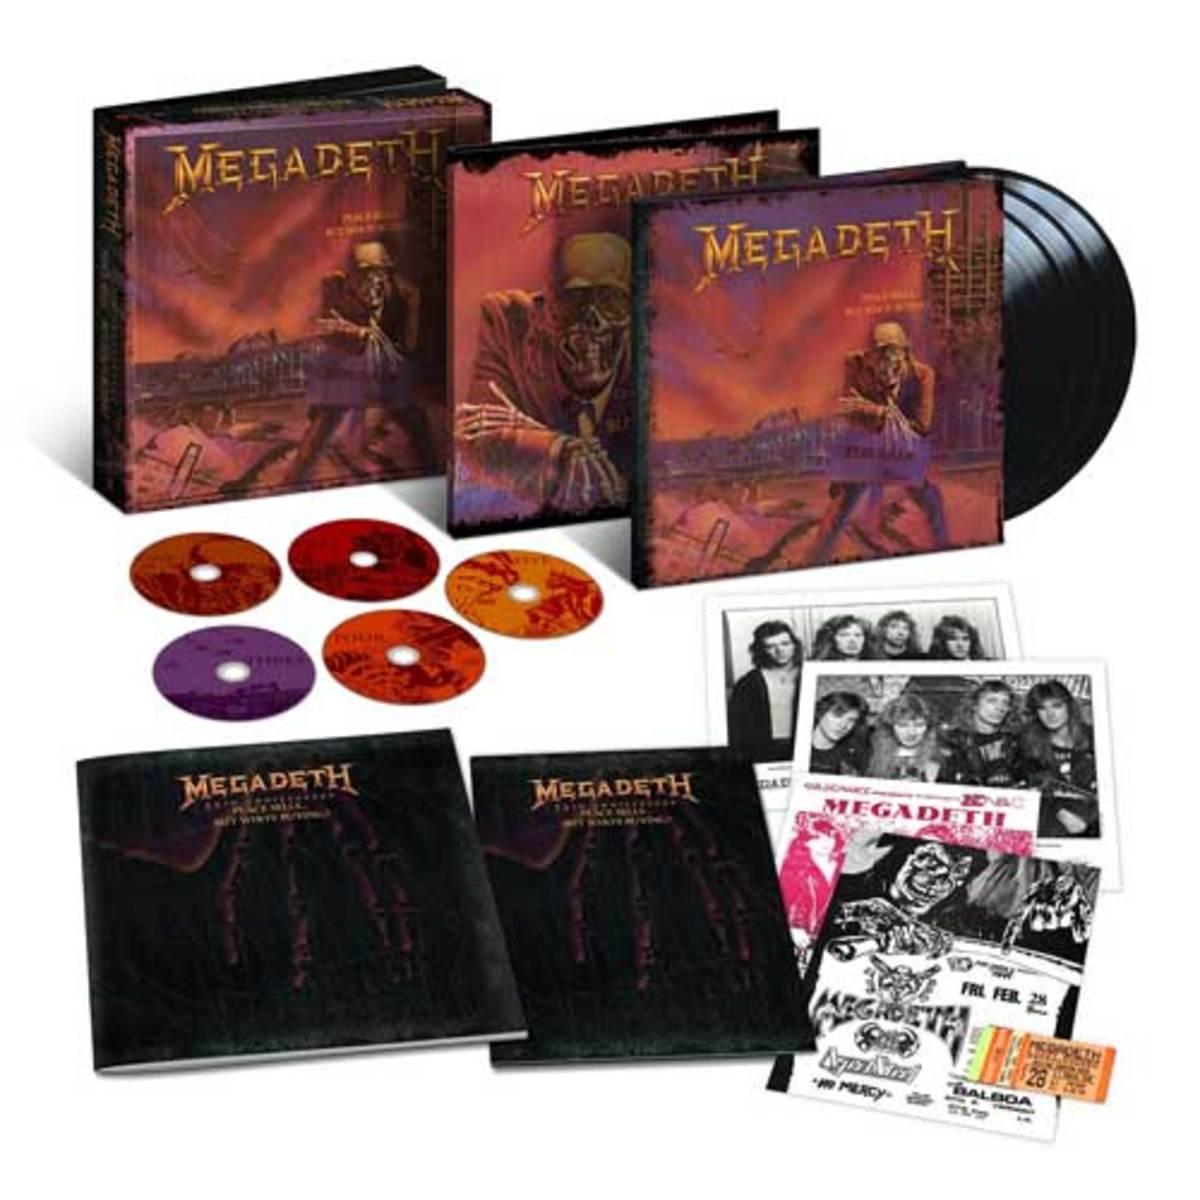 Megadeth_Peace_Sells_25th_Anniv_packshot